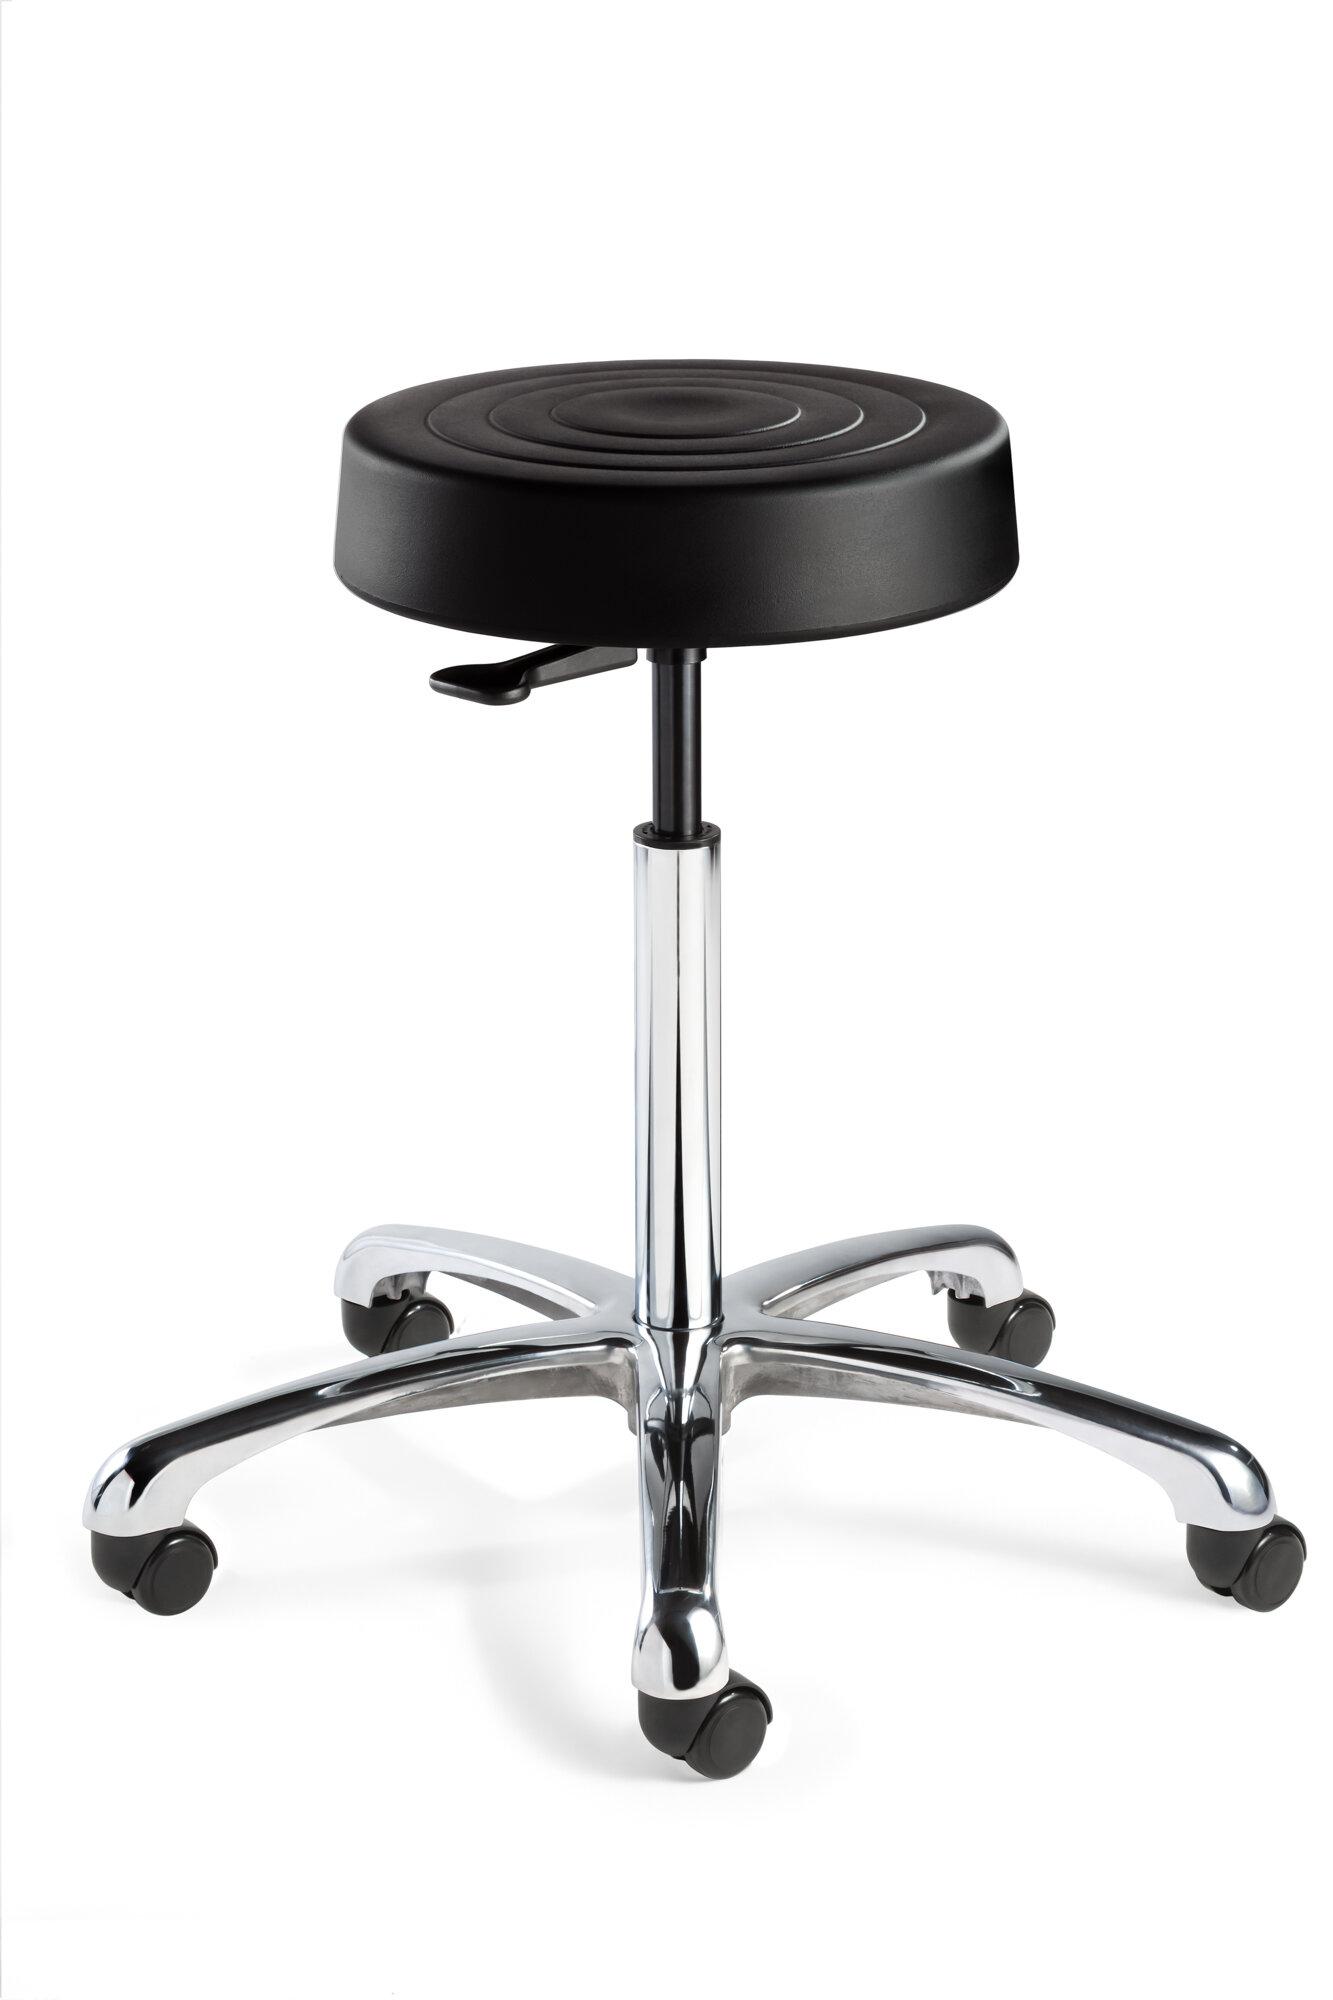 bevco ergolux height adjustable backless stool with dual wheel hard floor casters wayfair. Black Bedroom Furniture Sets. Home Design Ideas